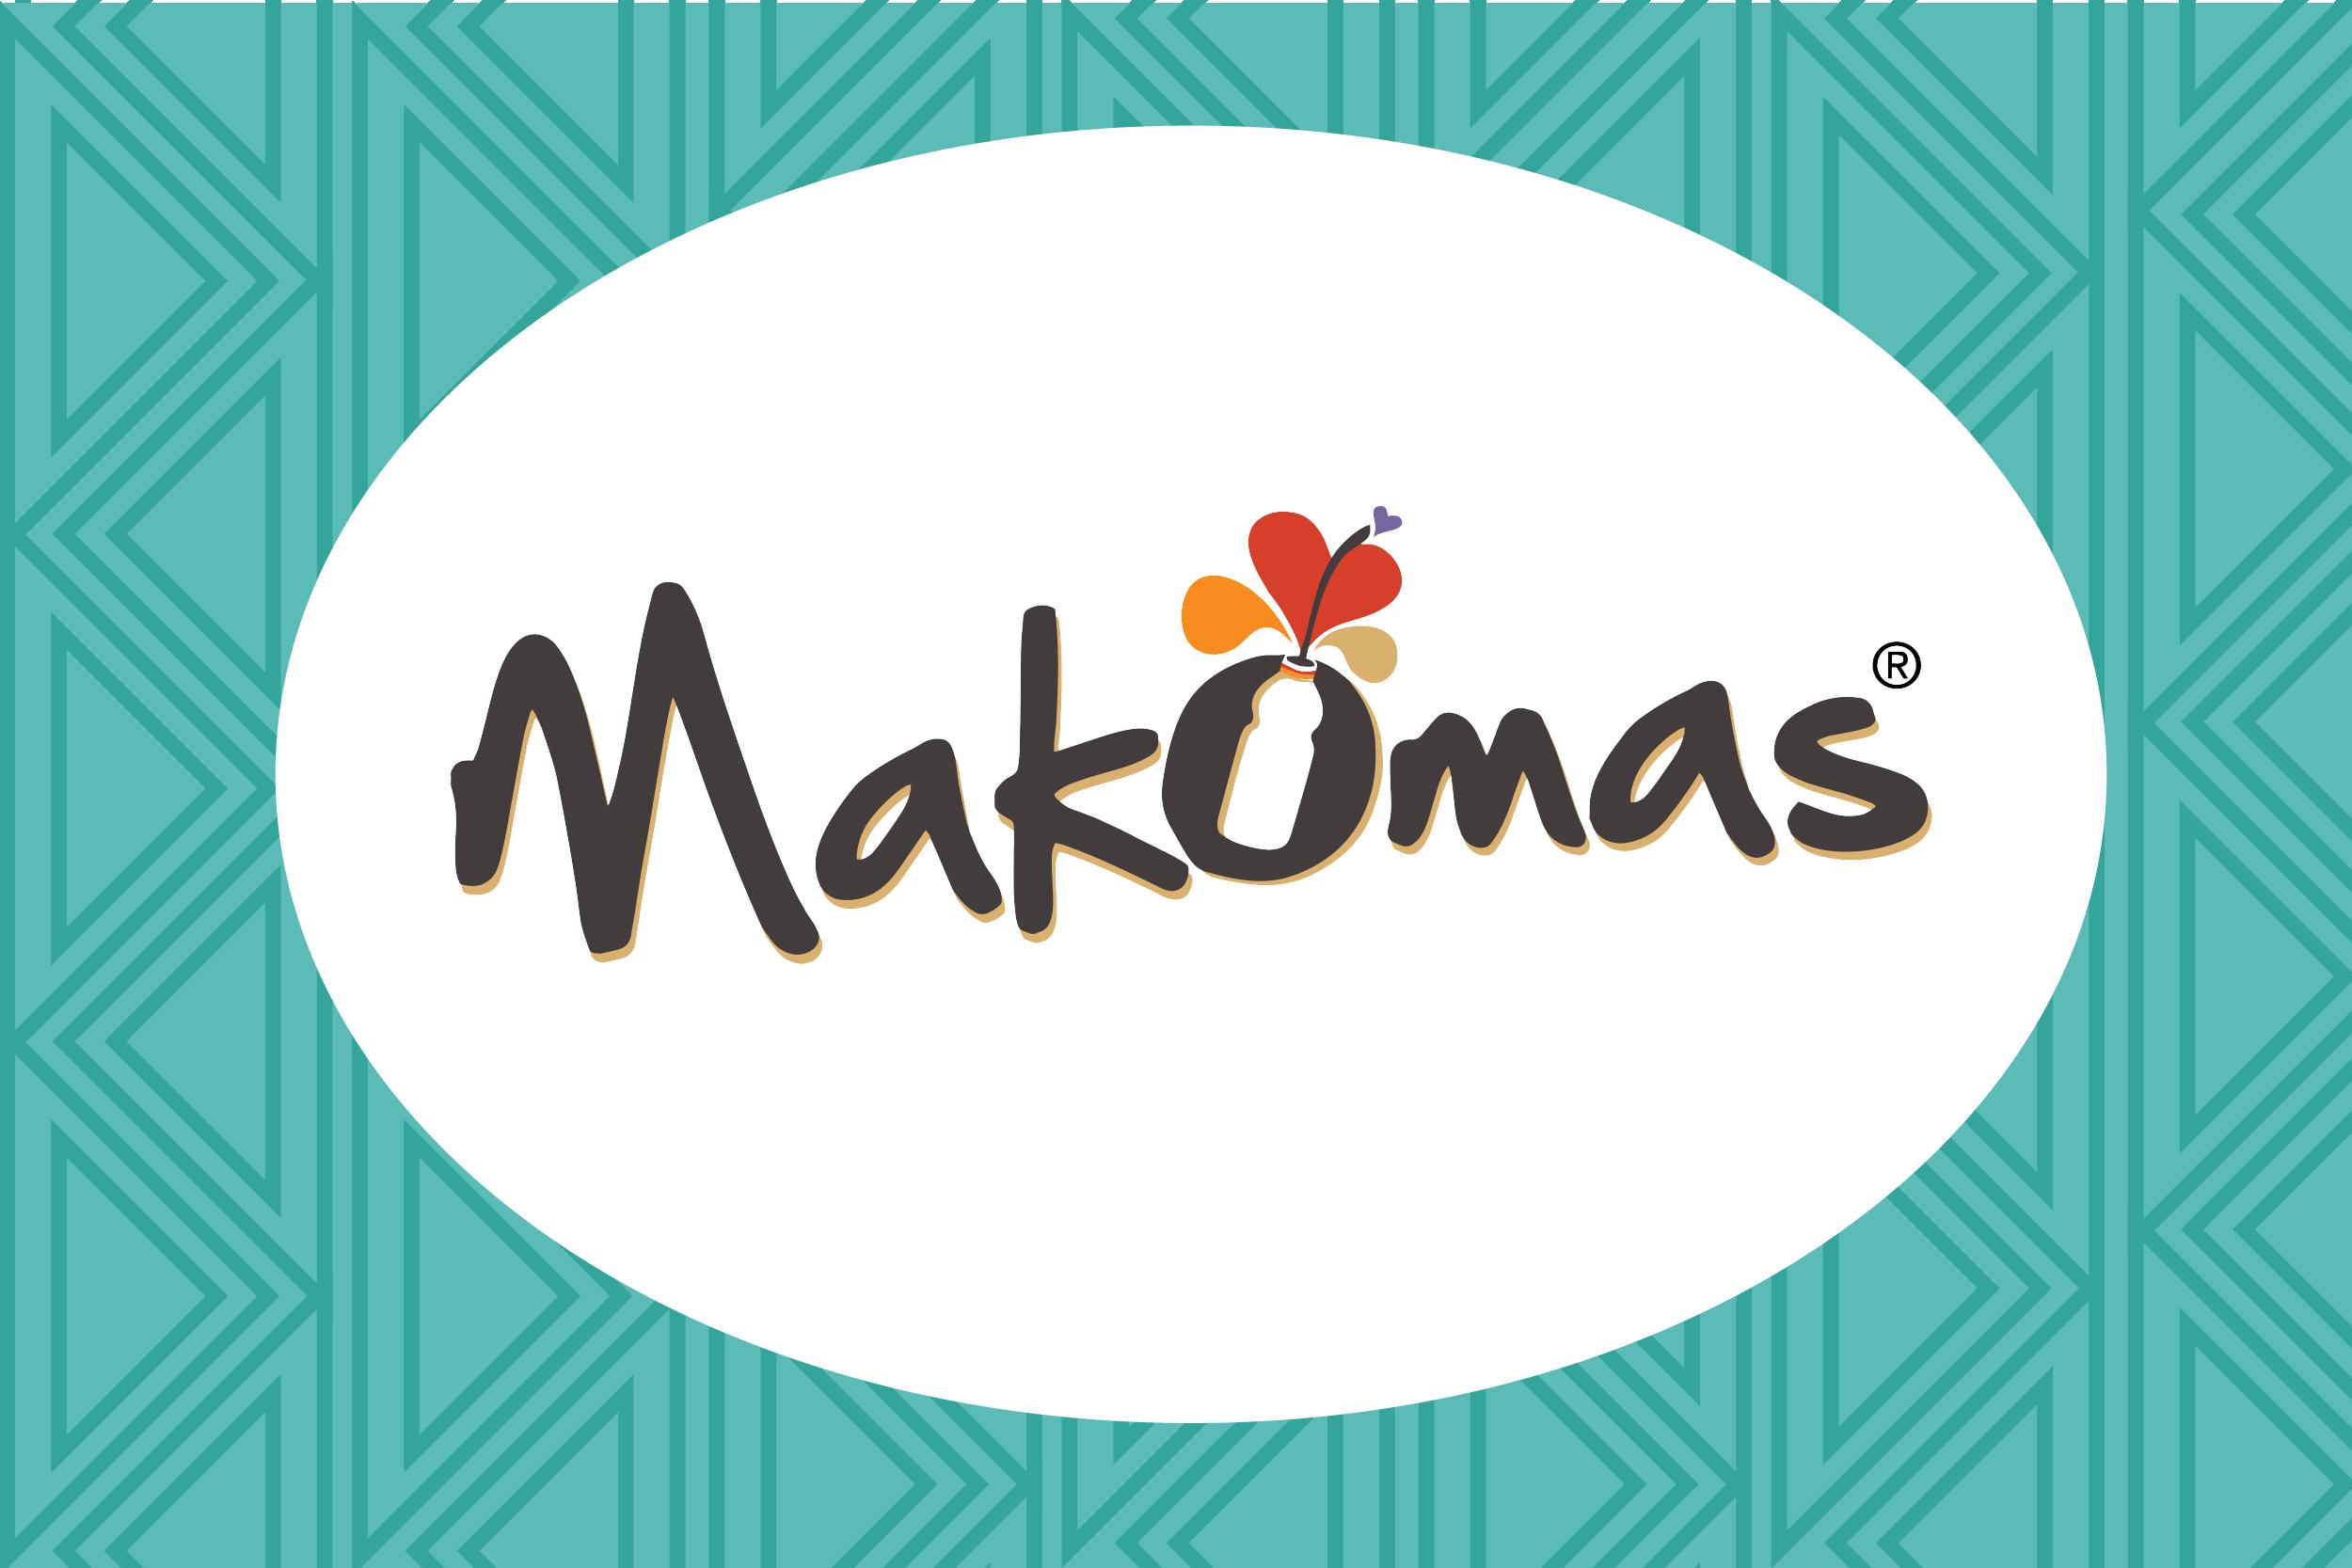 Business Card - Boston - Makomas.png